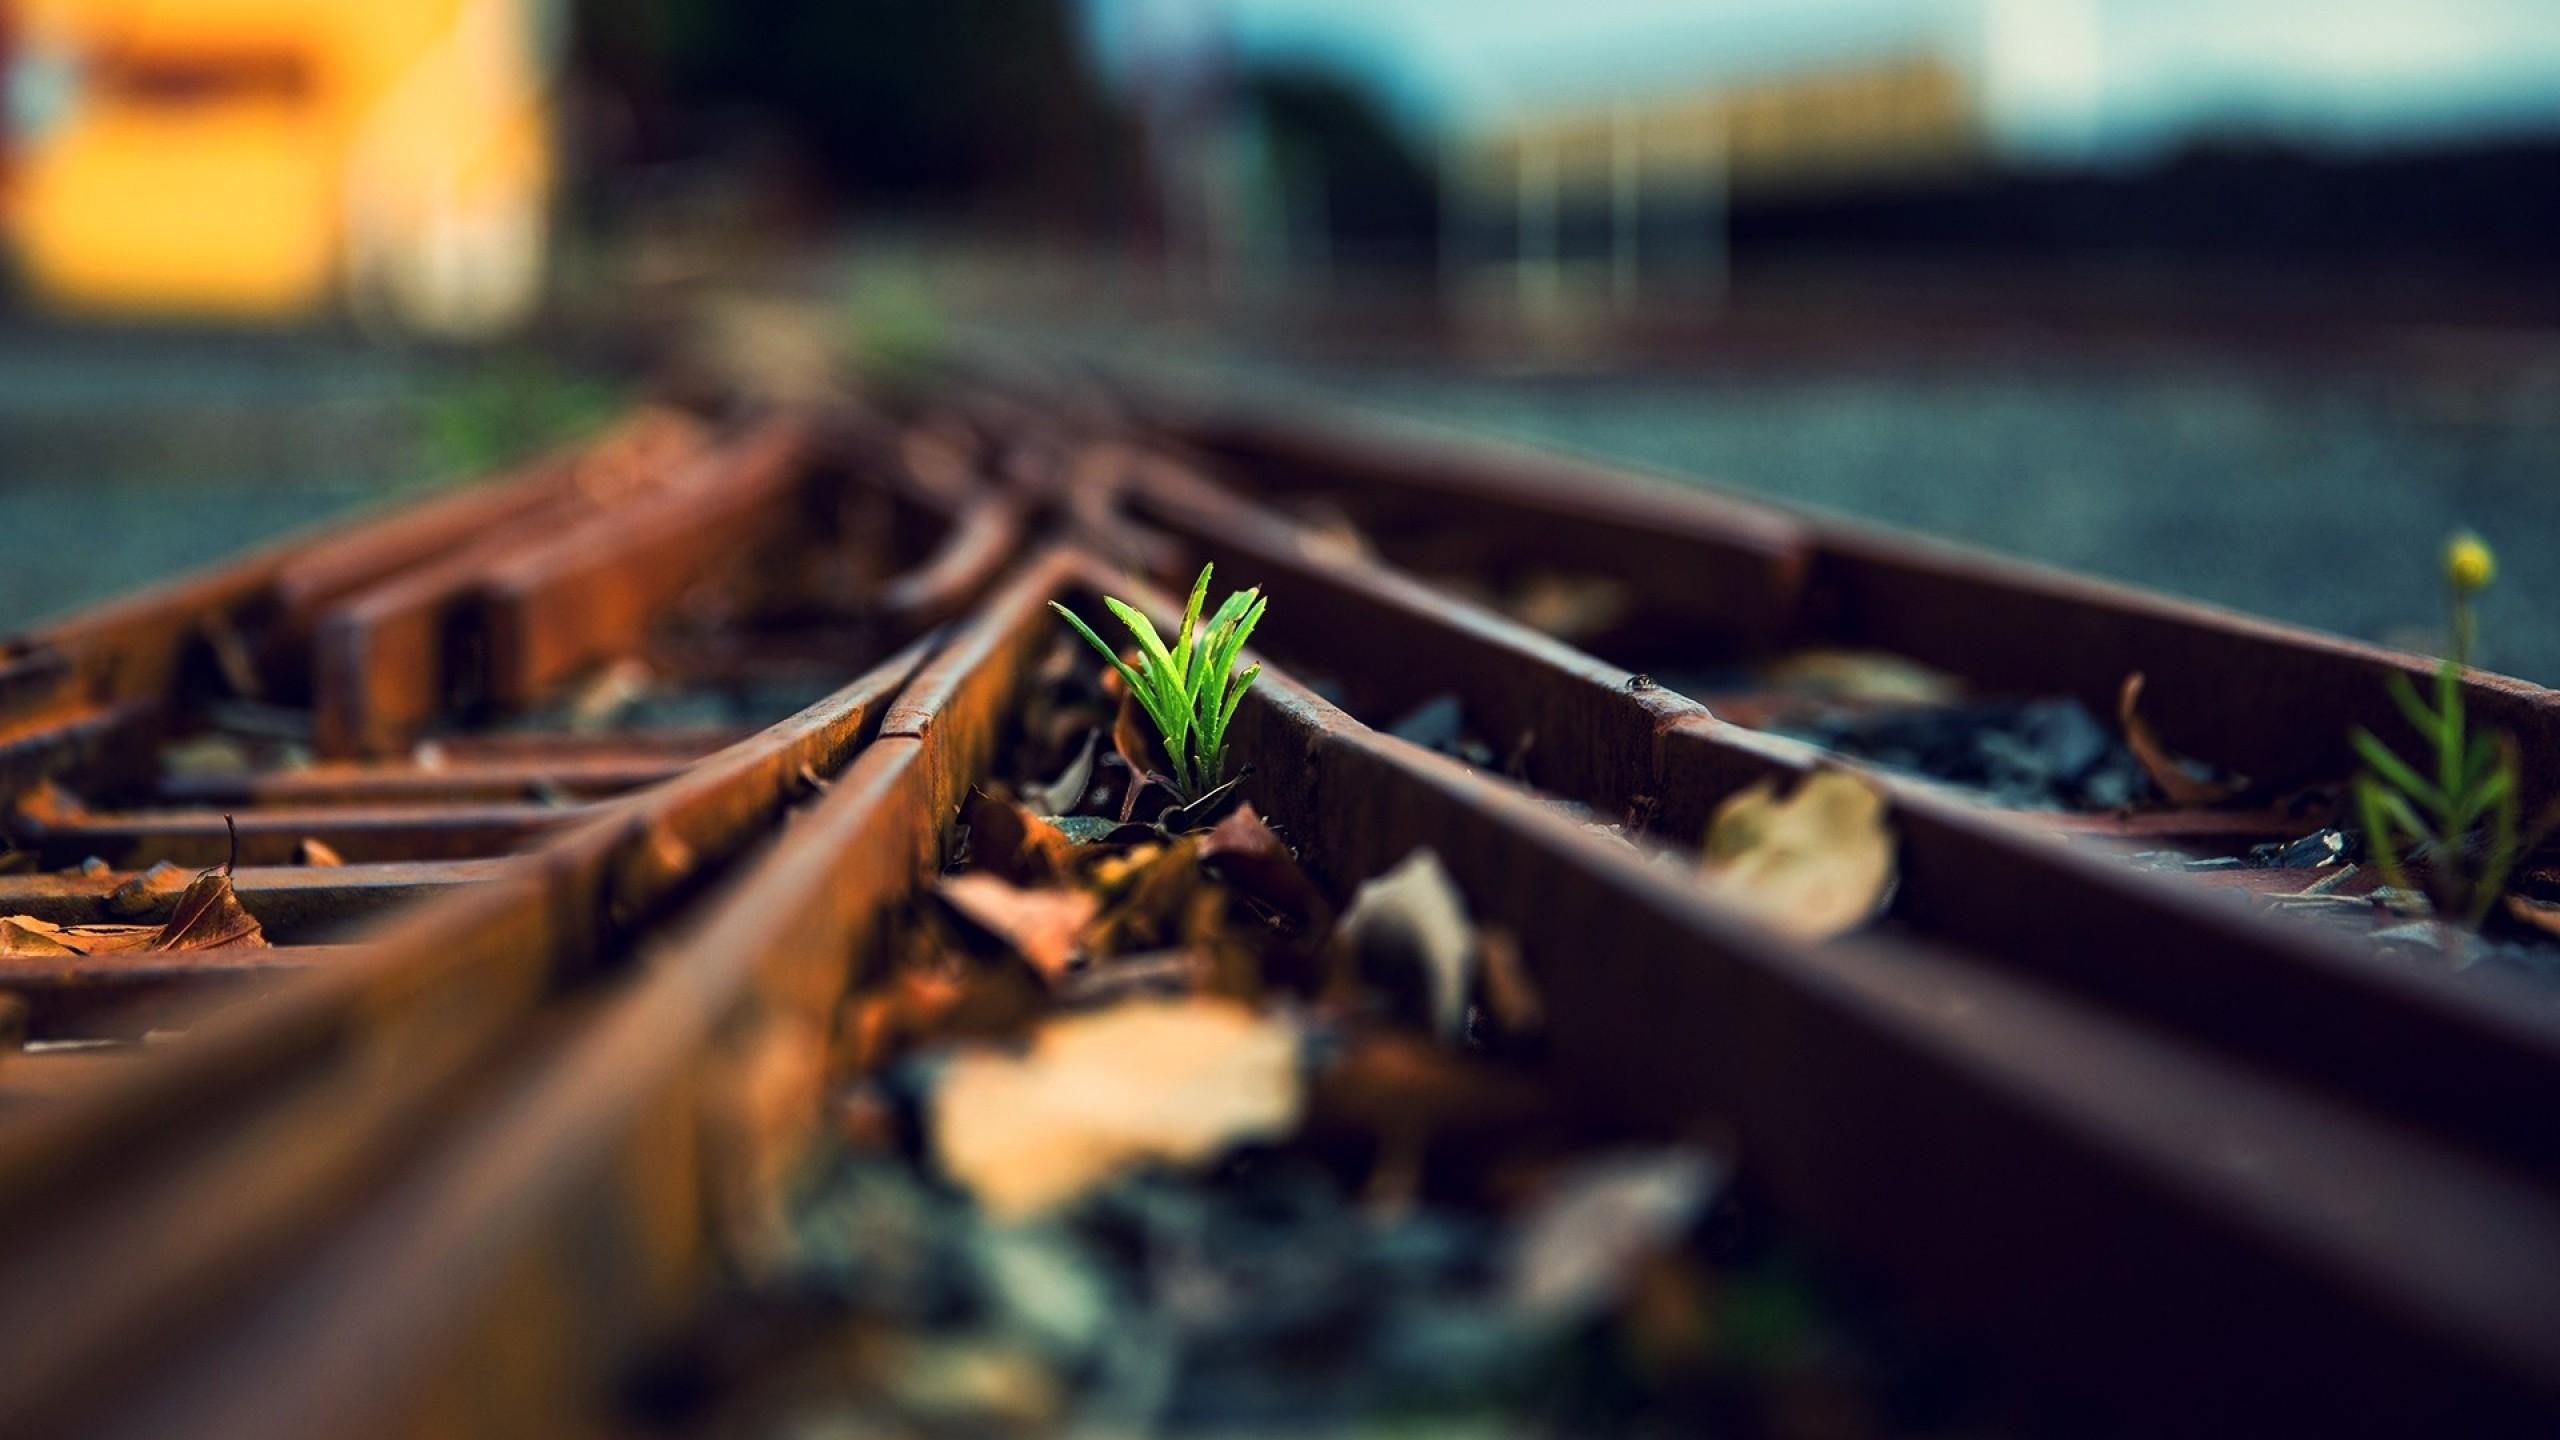 grass tracks train tracks wallpaper background 2560x1440